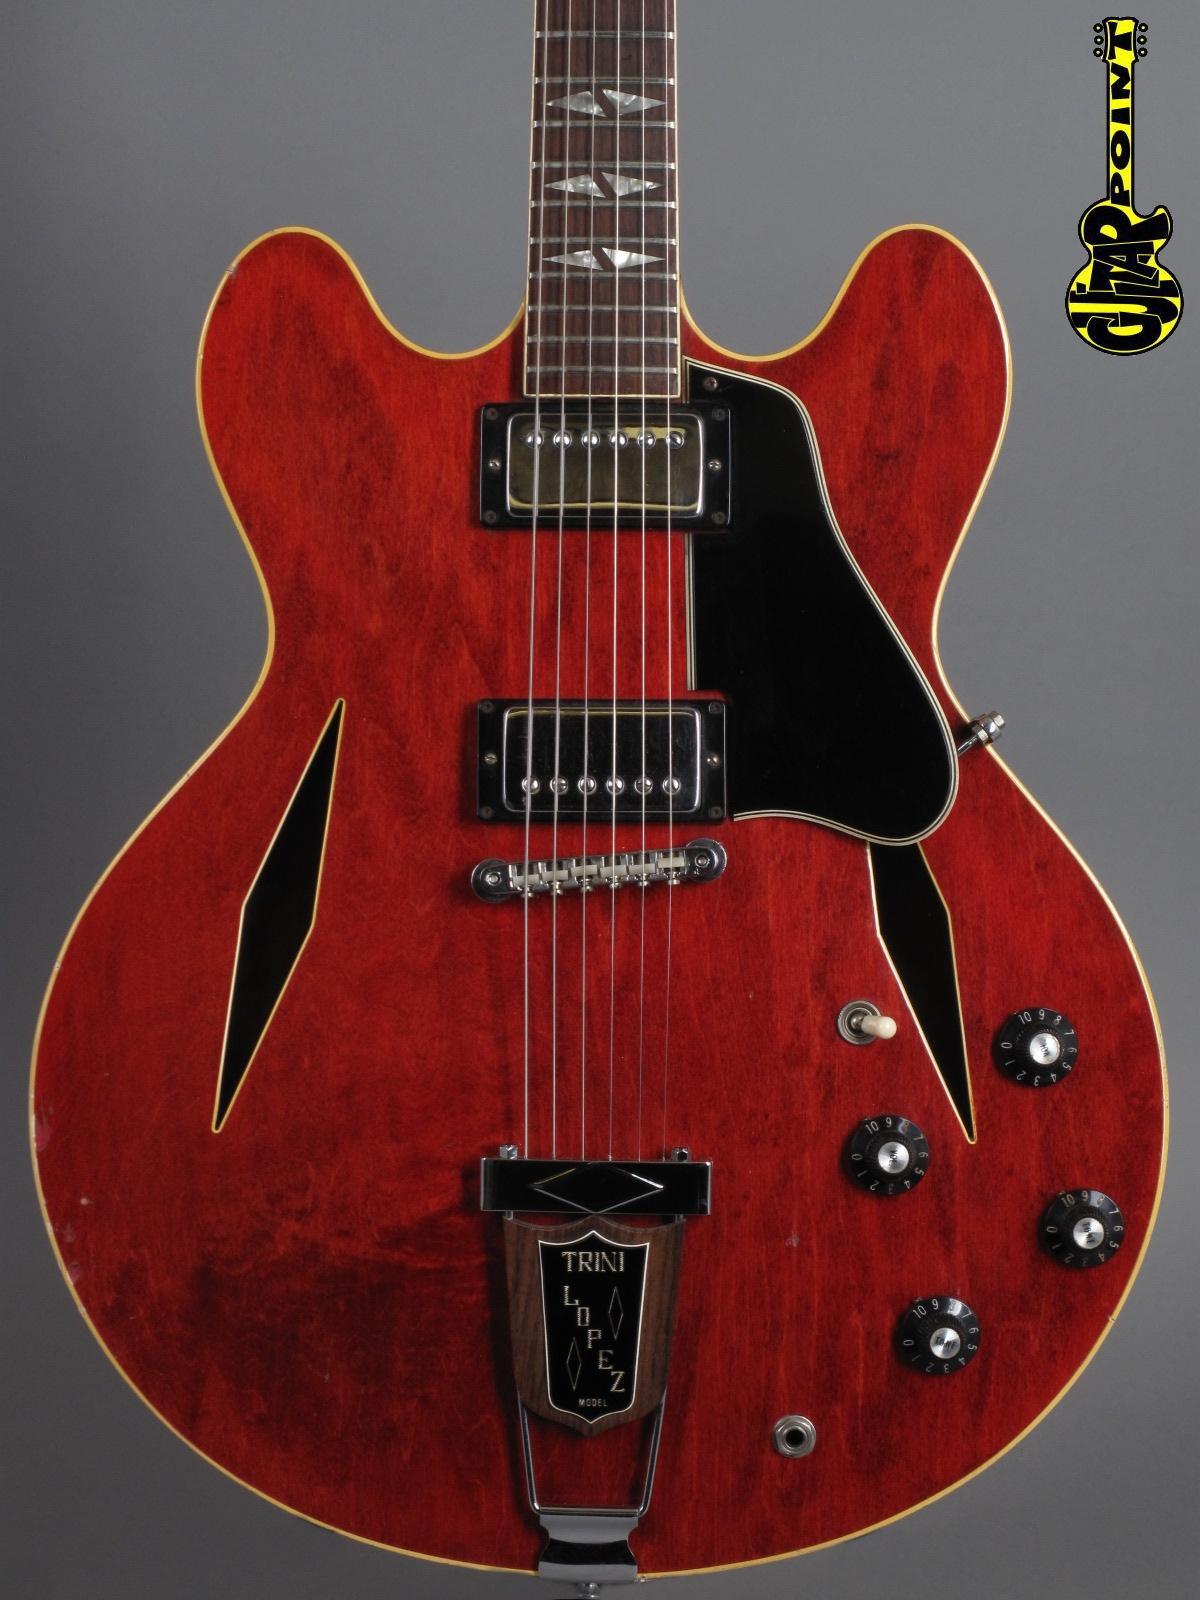 1967 Gibson Trini Lopez Standard - Cherry